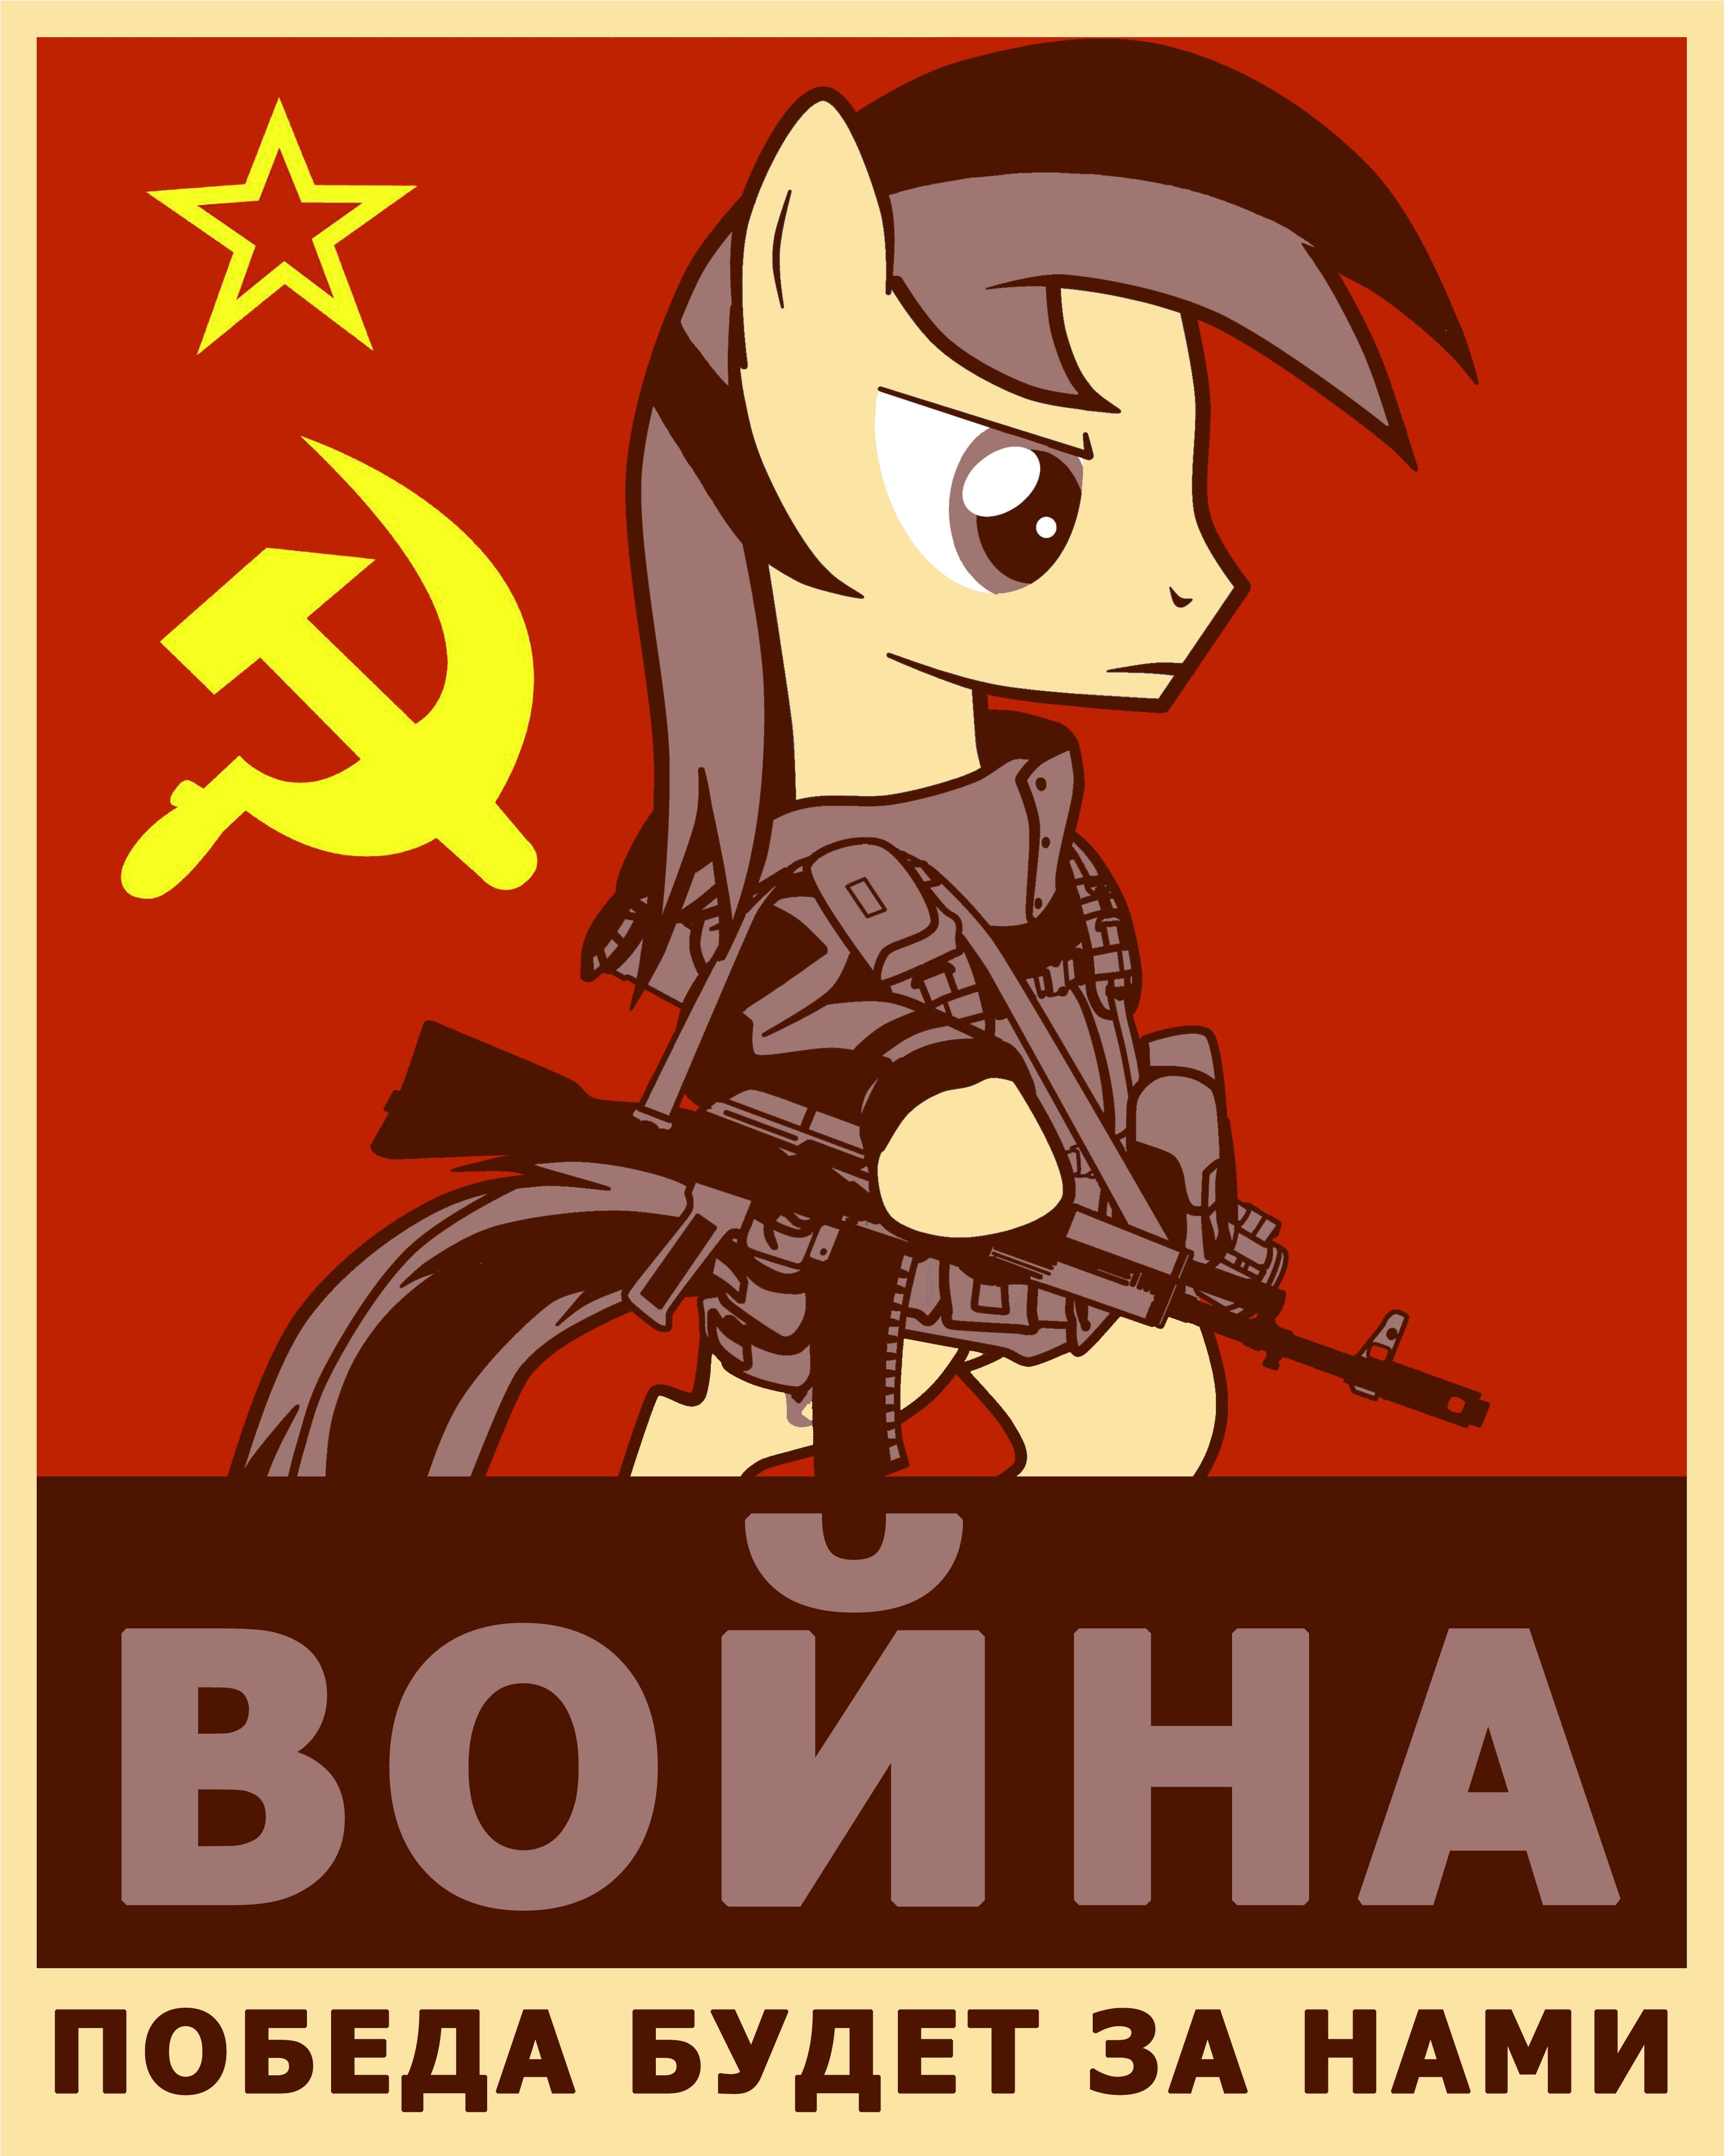 Soviet Pony Propaganda Poster by kta1540